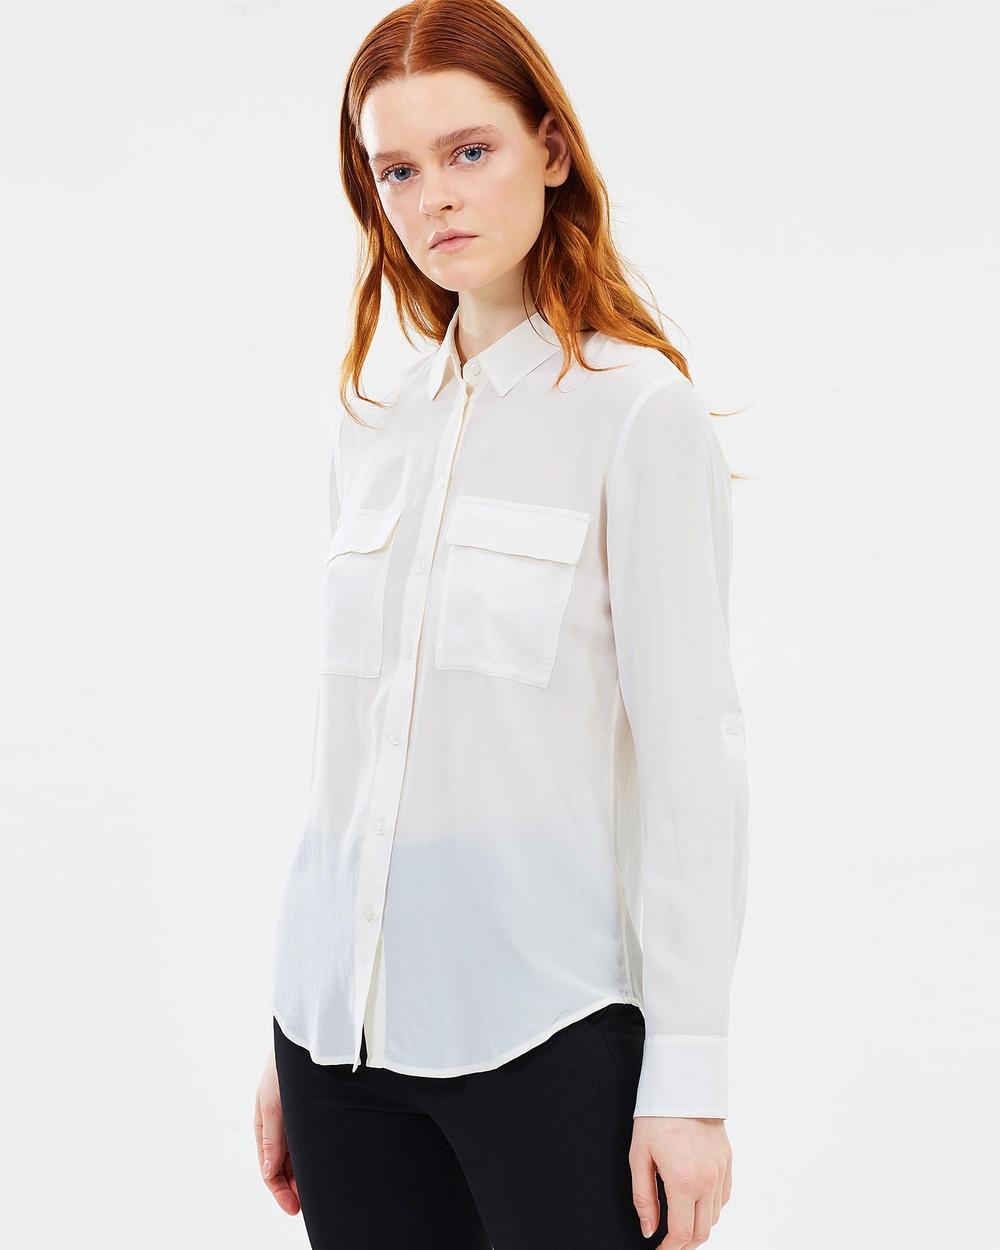 Marcs Sofia Silk Shirt Tops Ivory  Sofia Silk Shirt